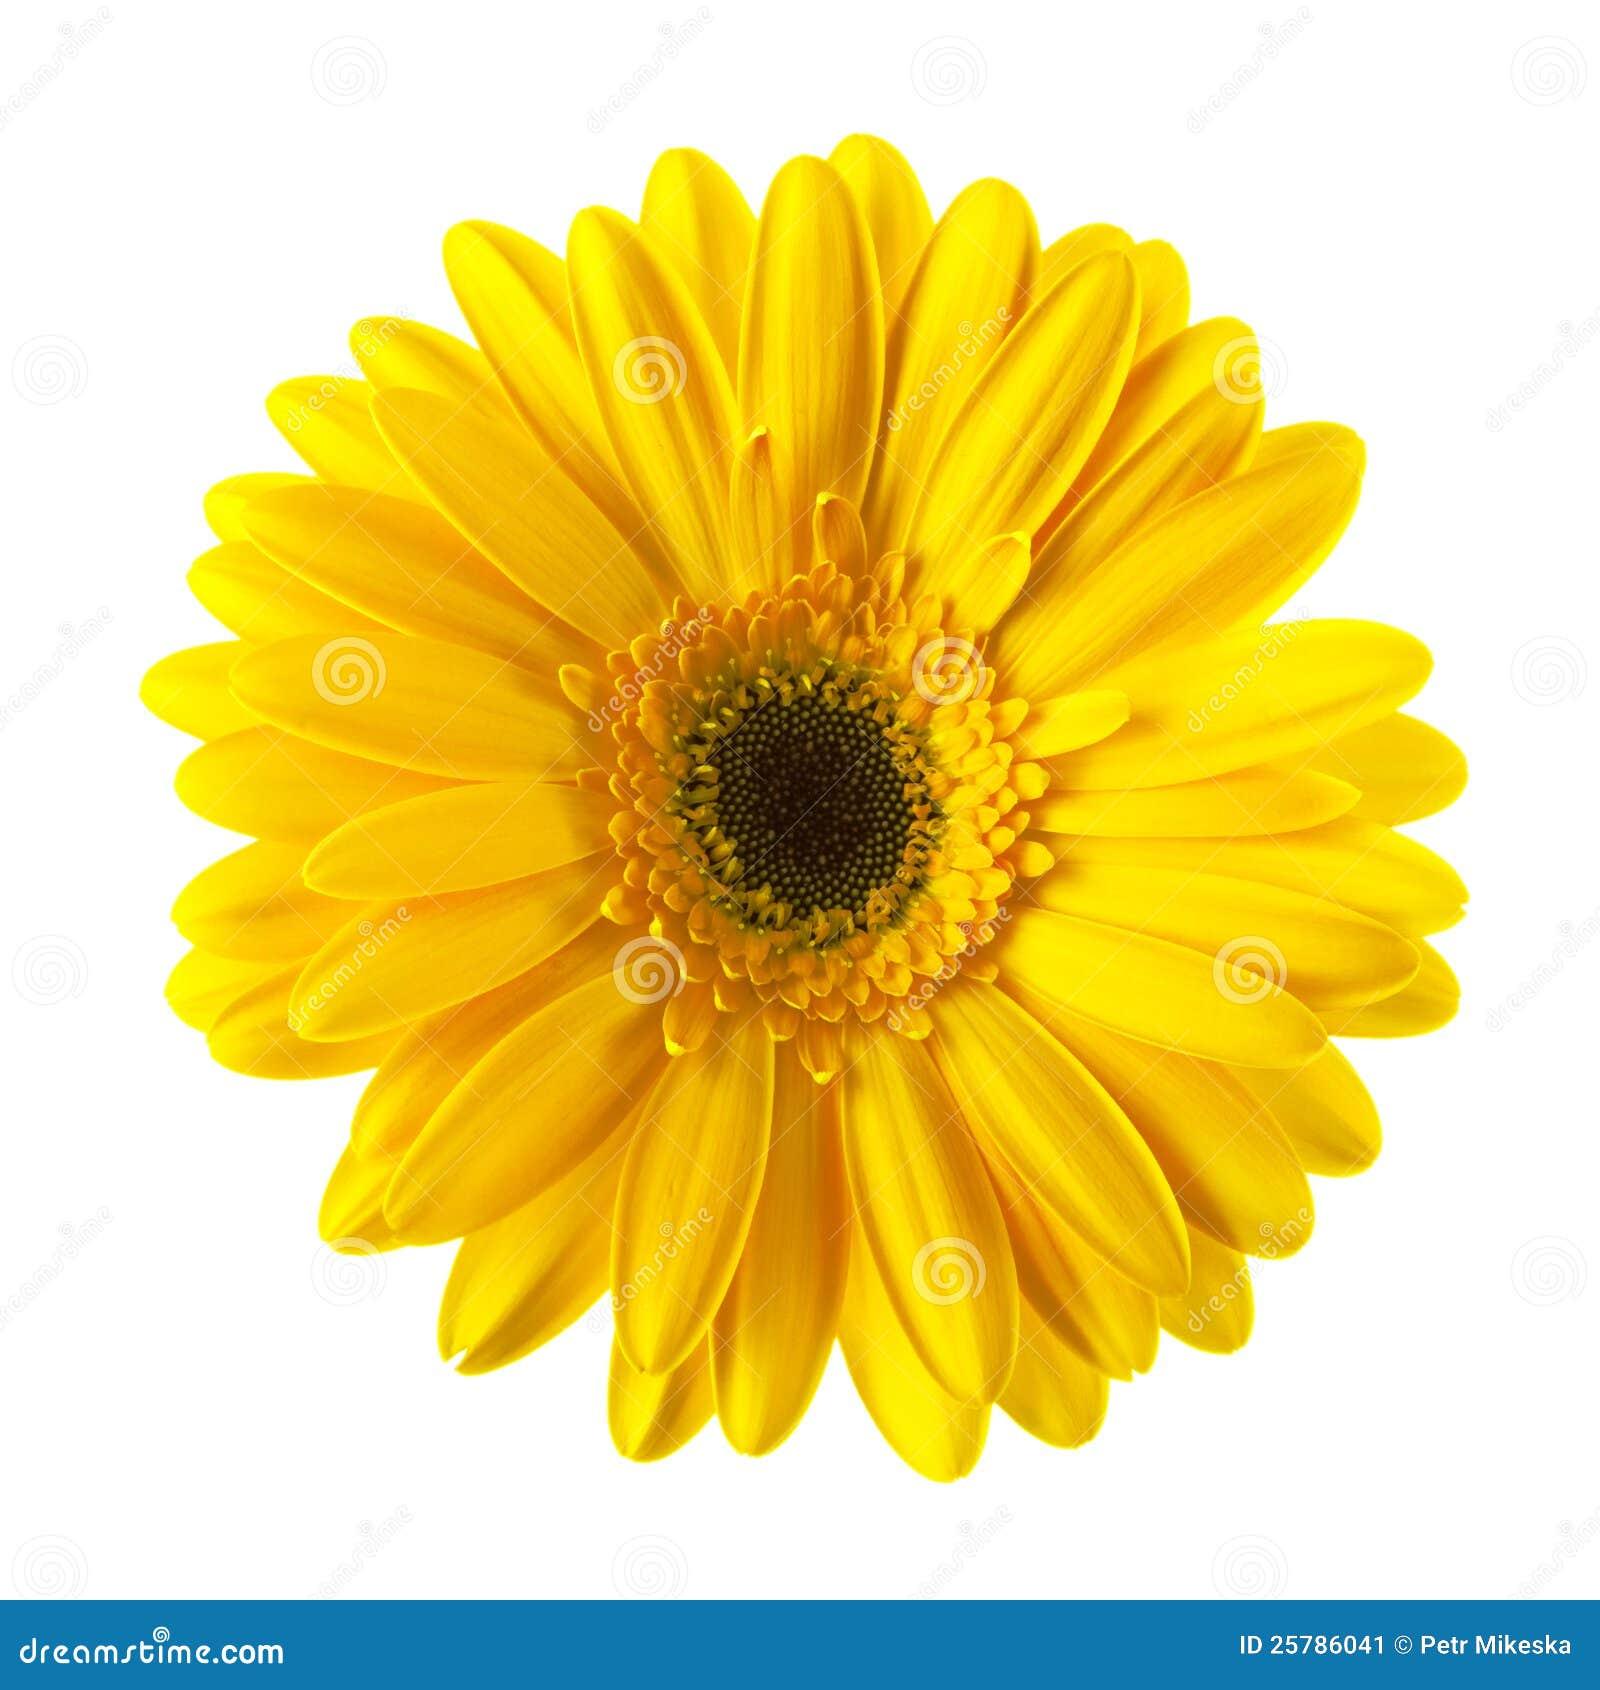 yellow daisy flower isolated stock image  image, Beautiful flower